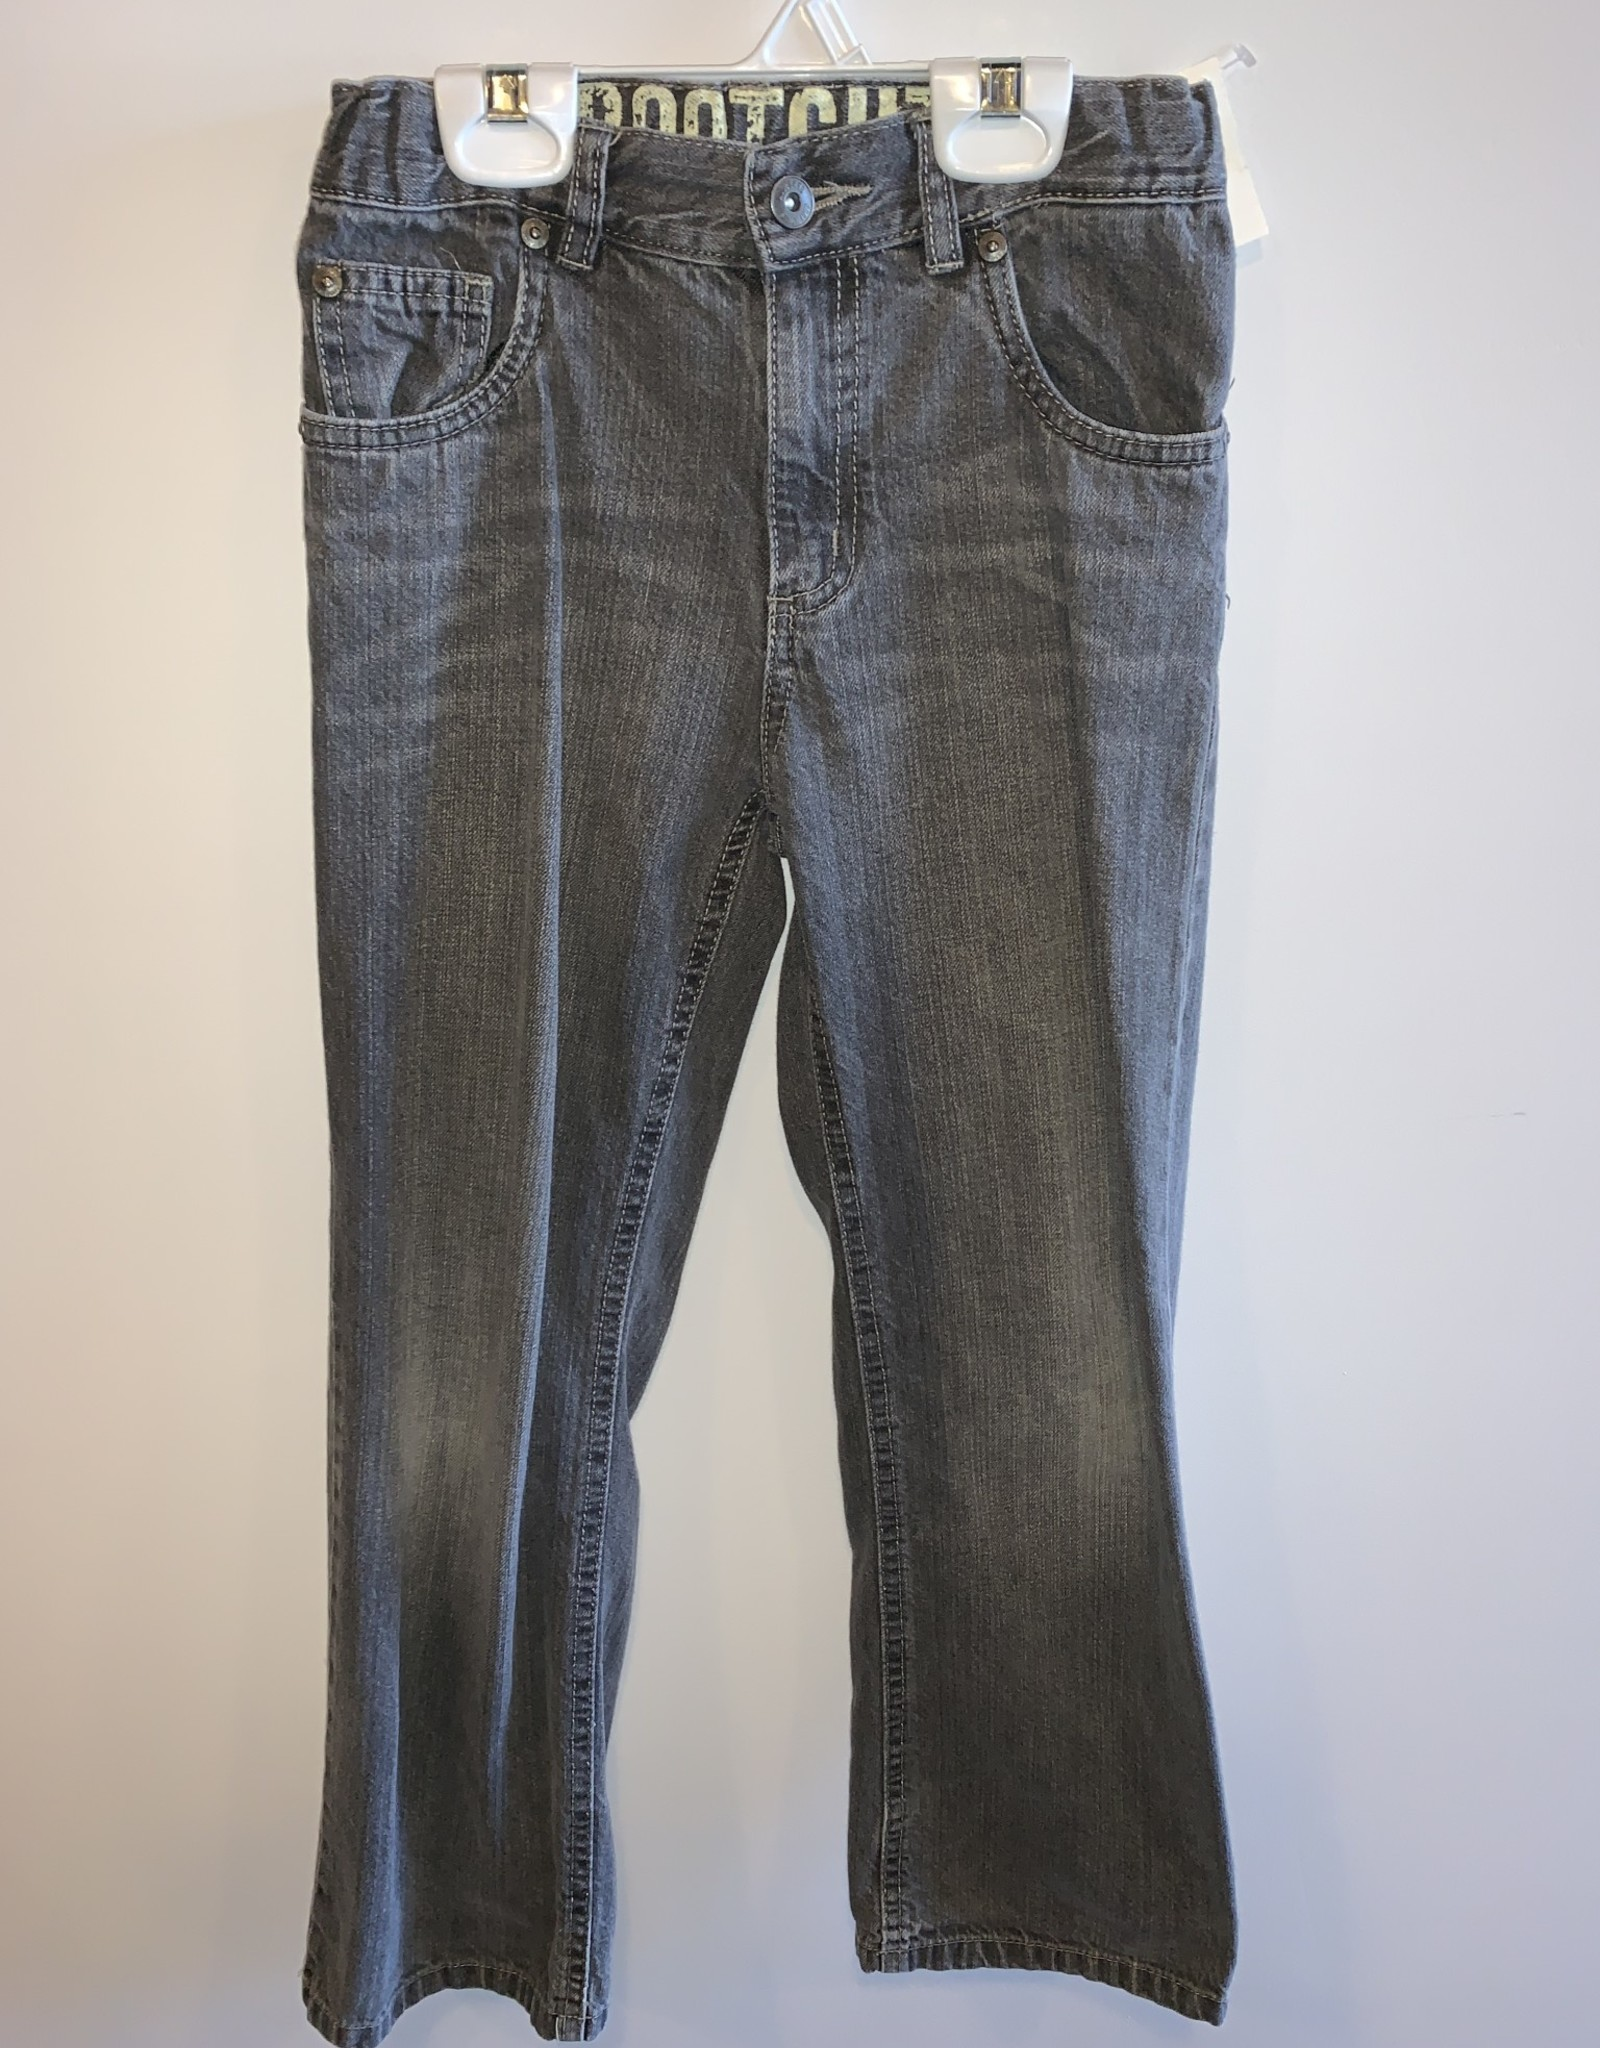 Woodland Boys/8/Woodland/Jeans